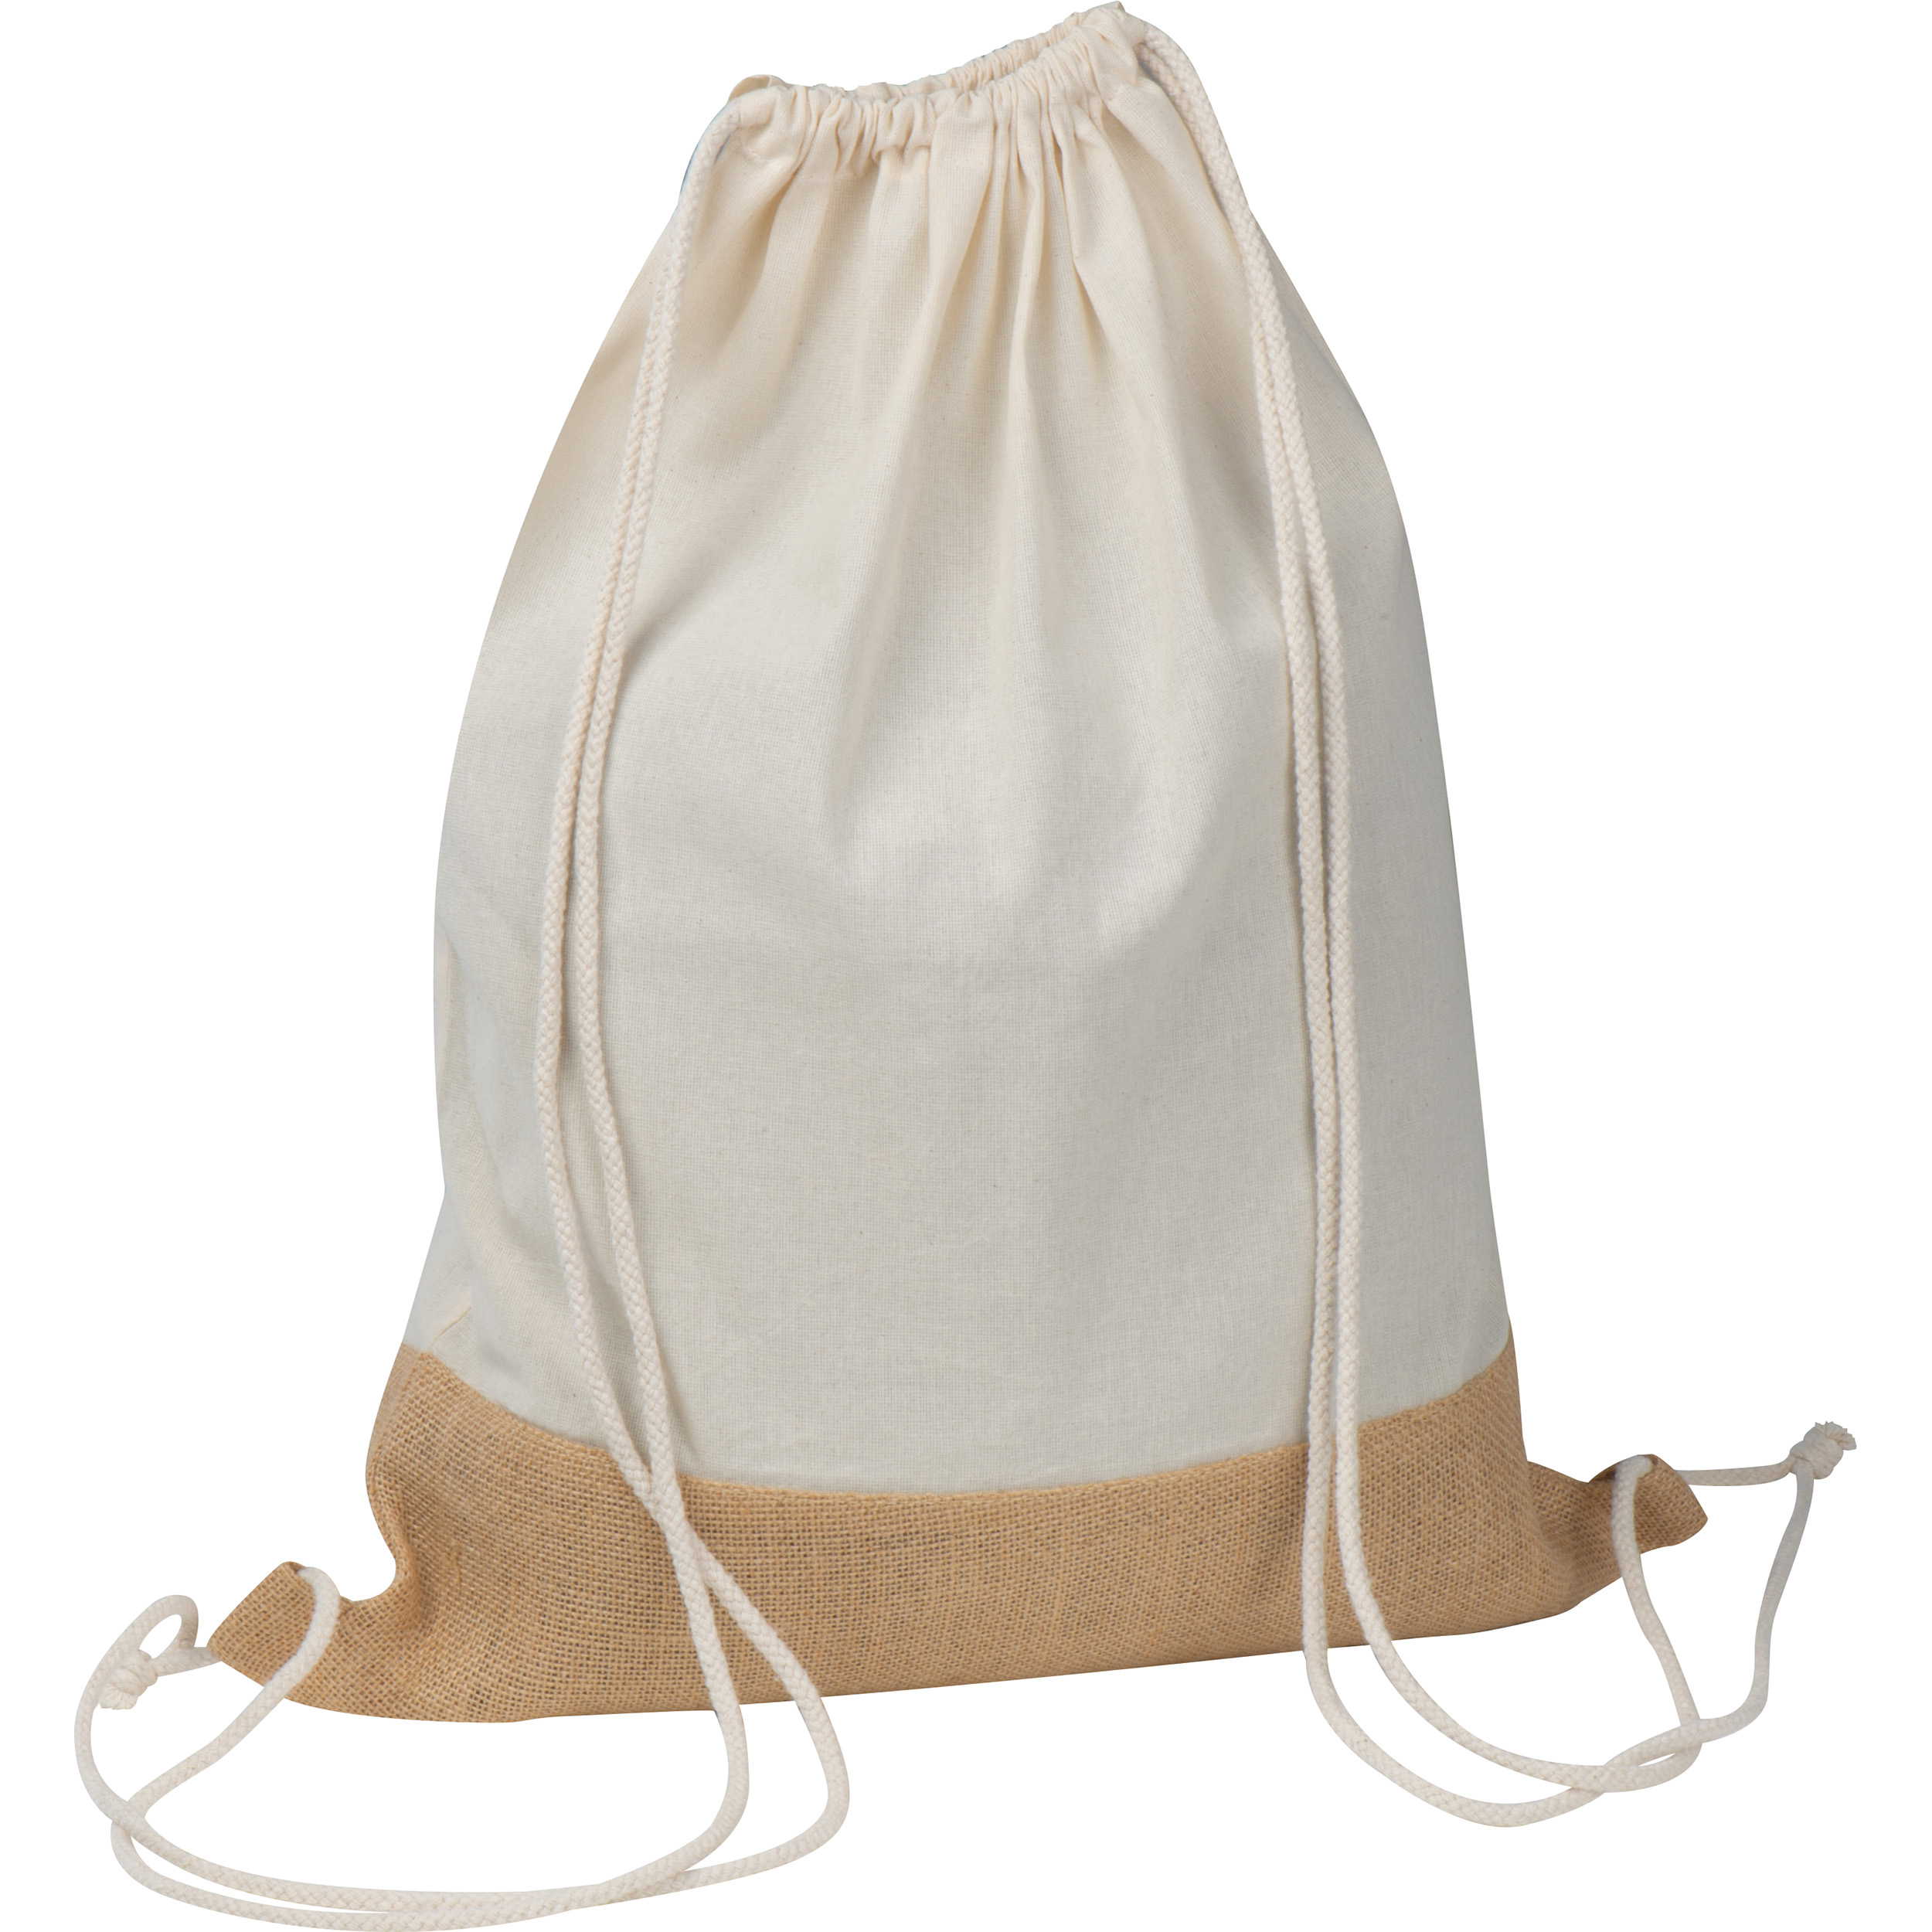 Gymbag avec fond en jute et cotton Oeko-Tex STANDARD 100